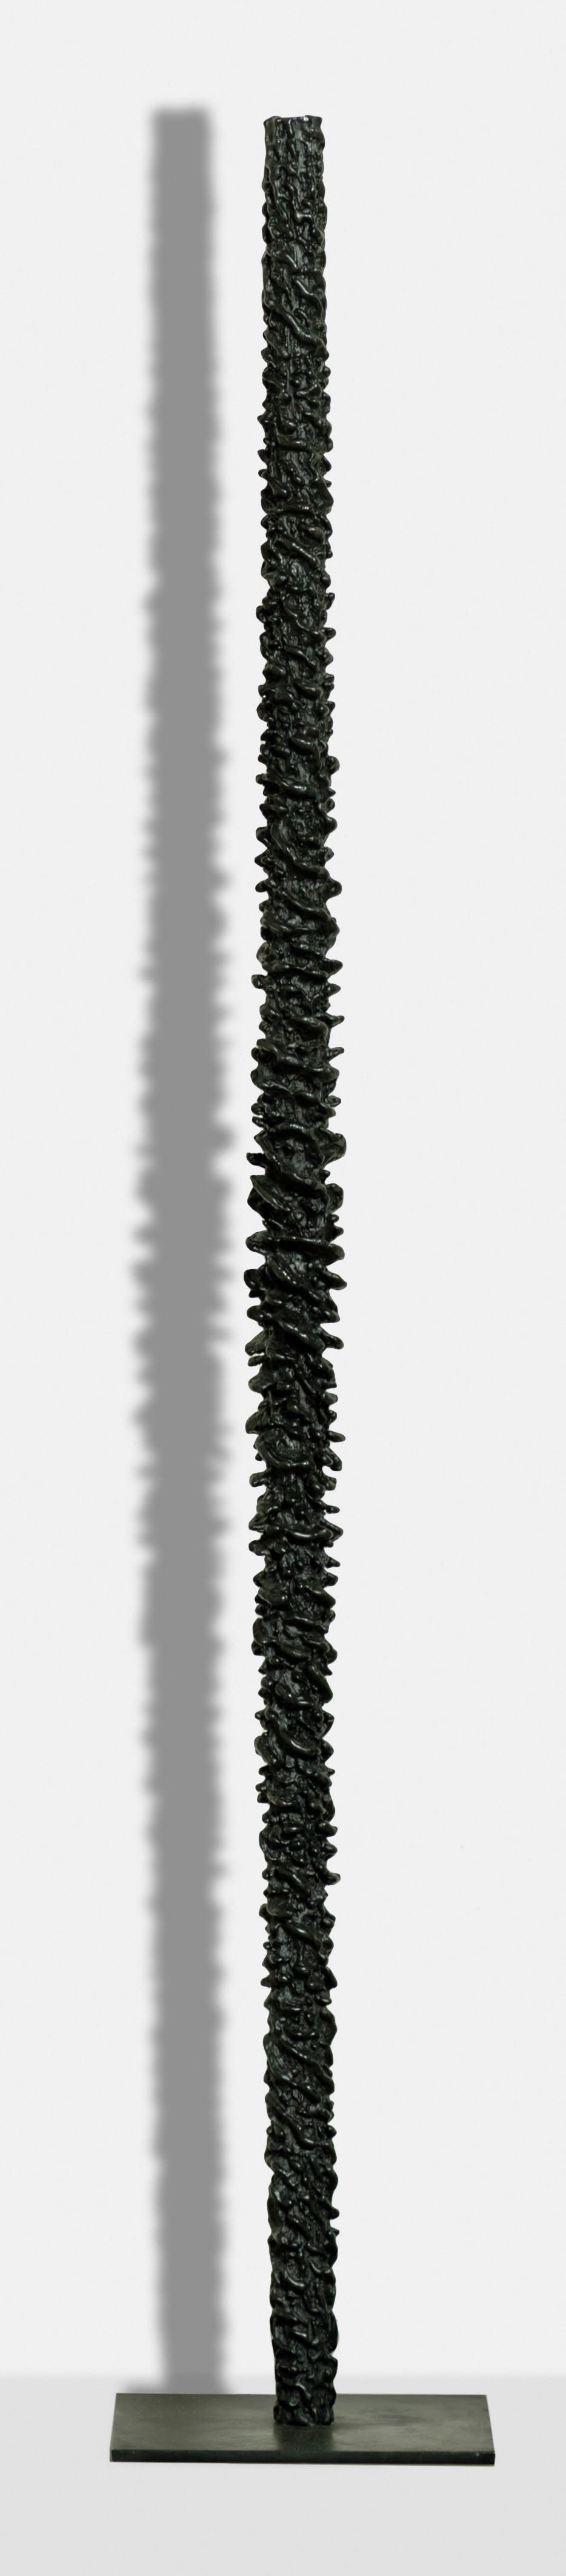 Martin Kline, Black Spiral (I), 2017